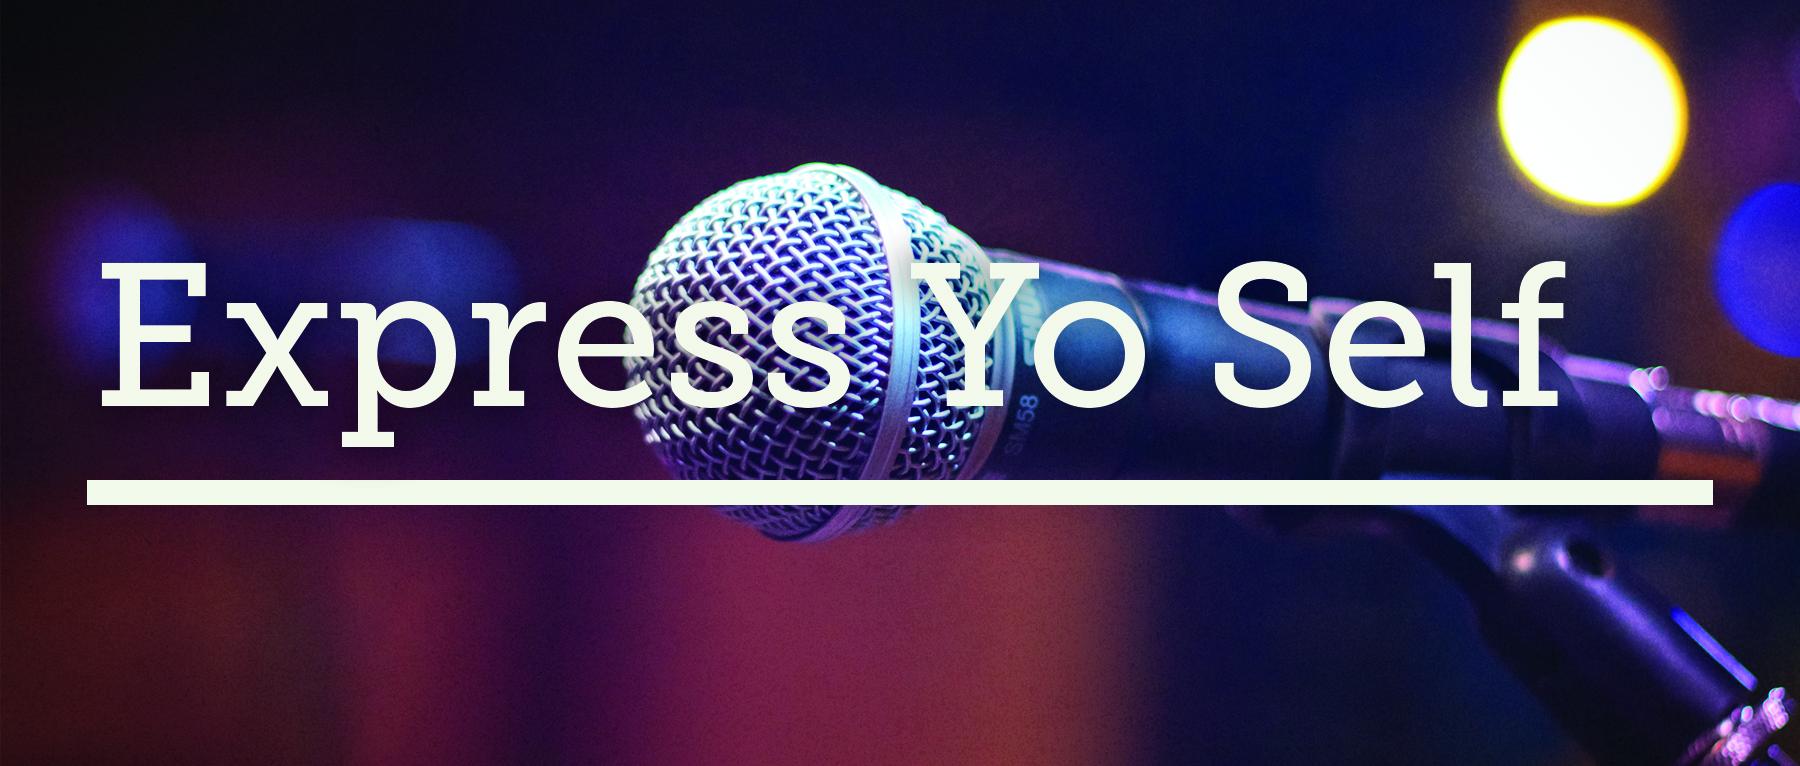 ExpressYoSelf_Web.jpg